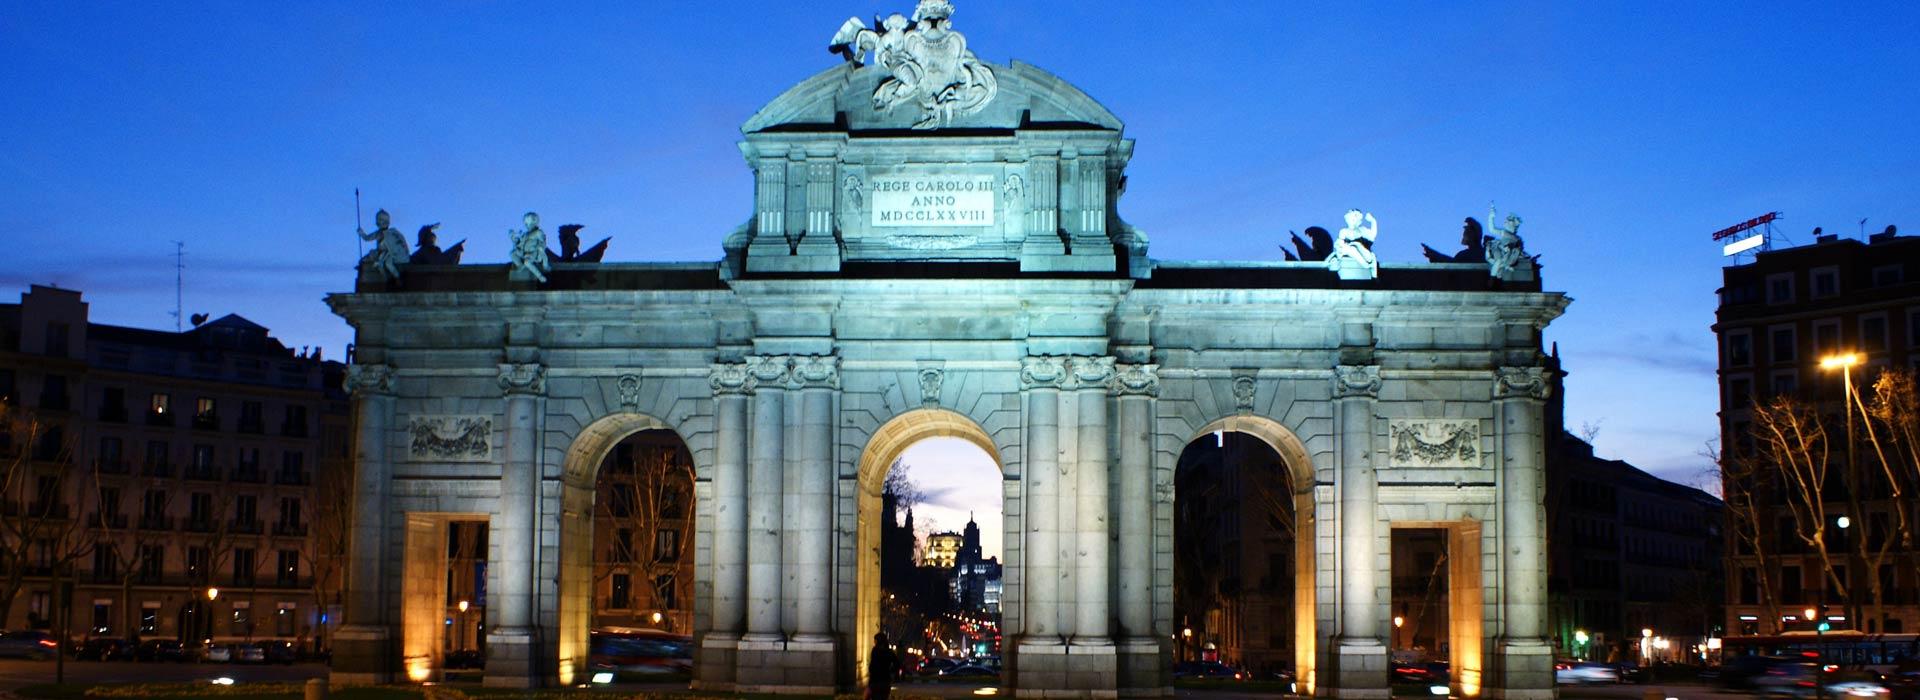 Madrid.Puerta de Alcalá